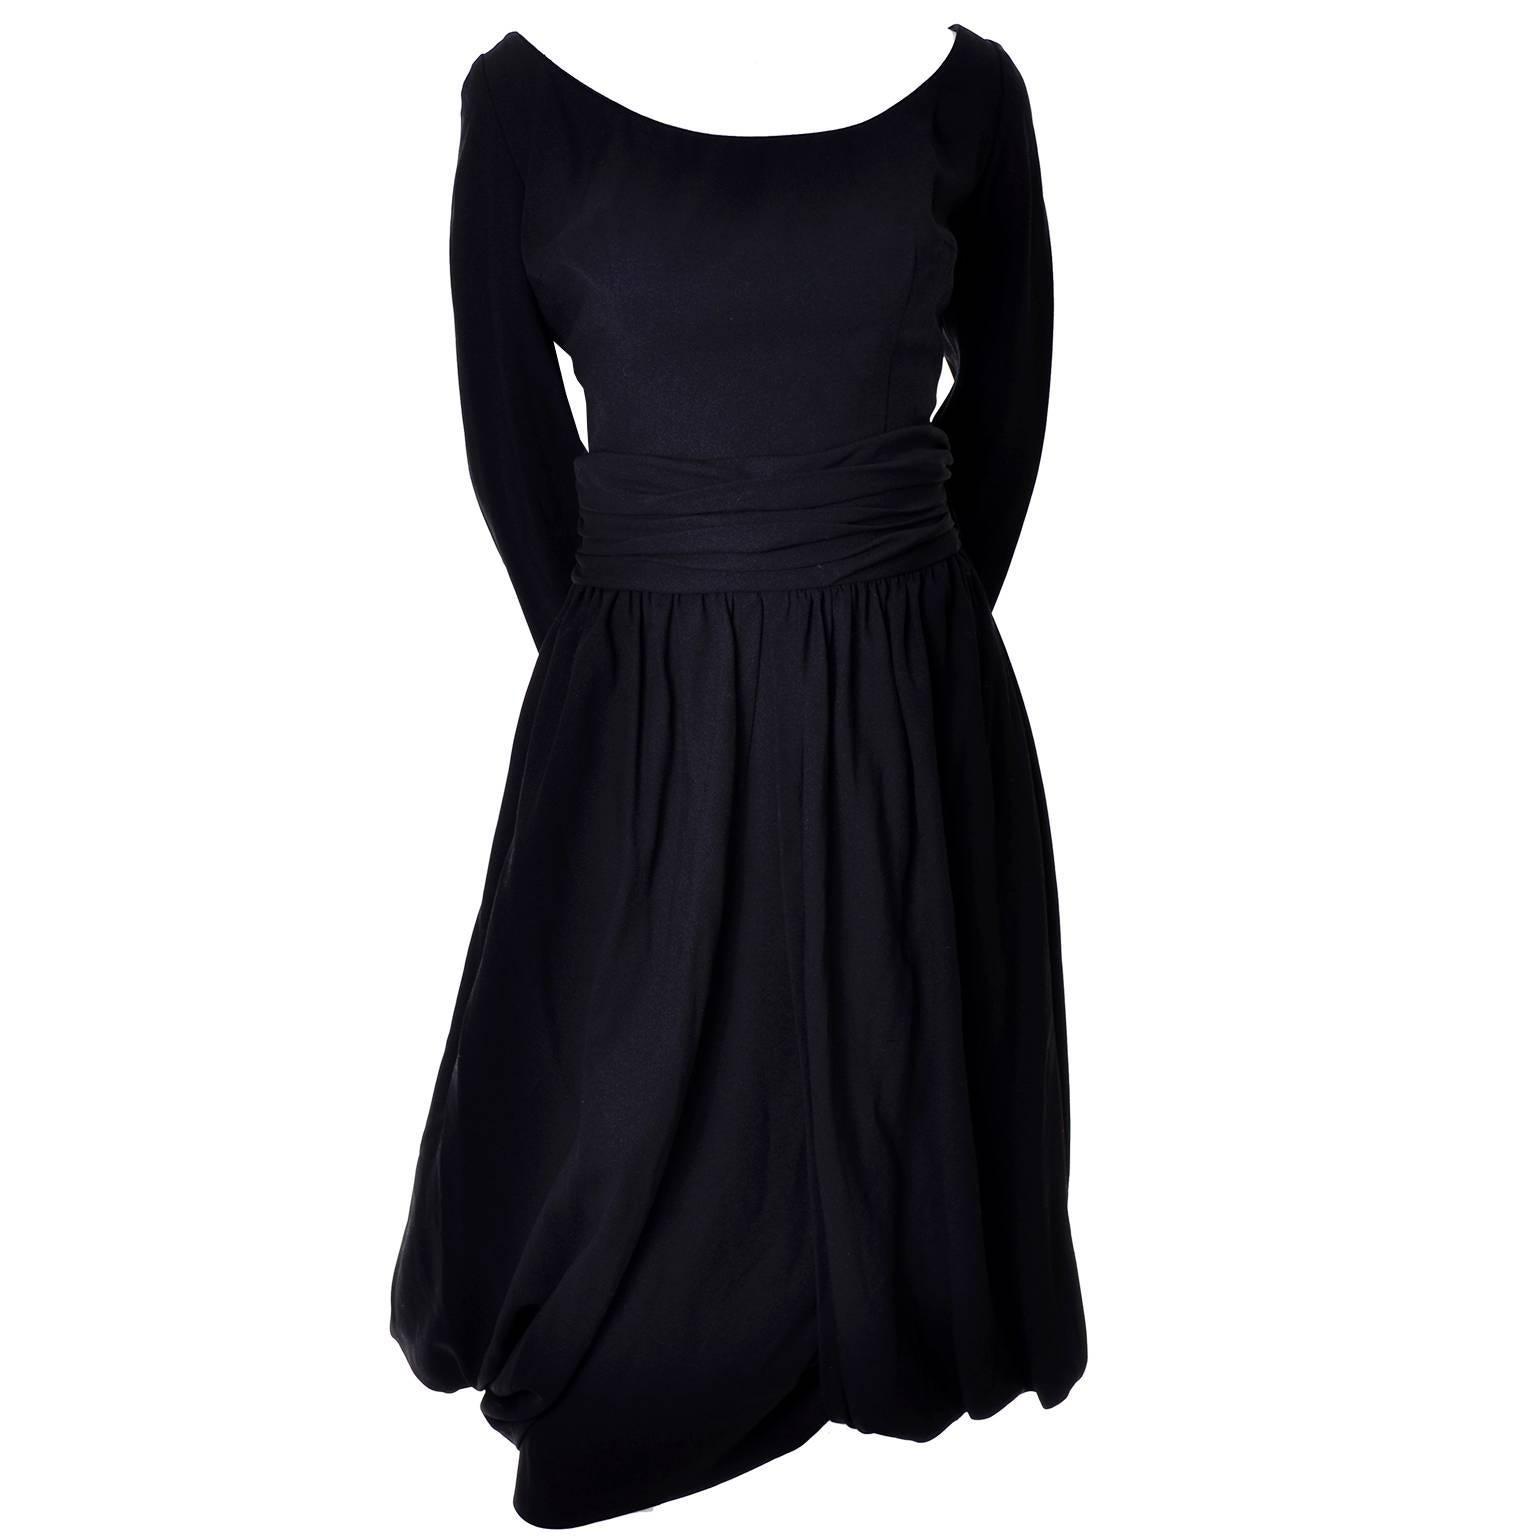 Mr. Blackwell Vintage Black Silk Crepe Dress Fly Away Panels Mid Century 8/10